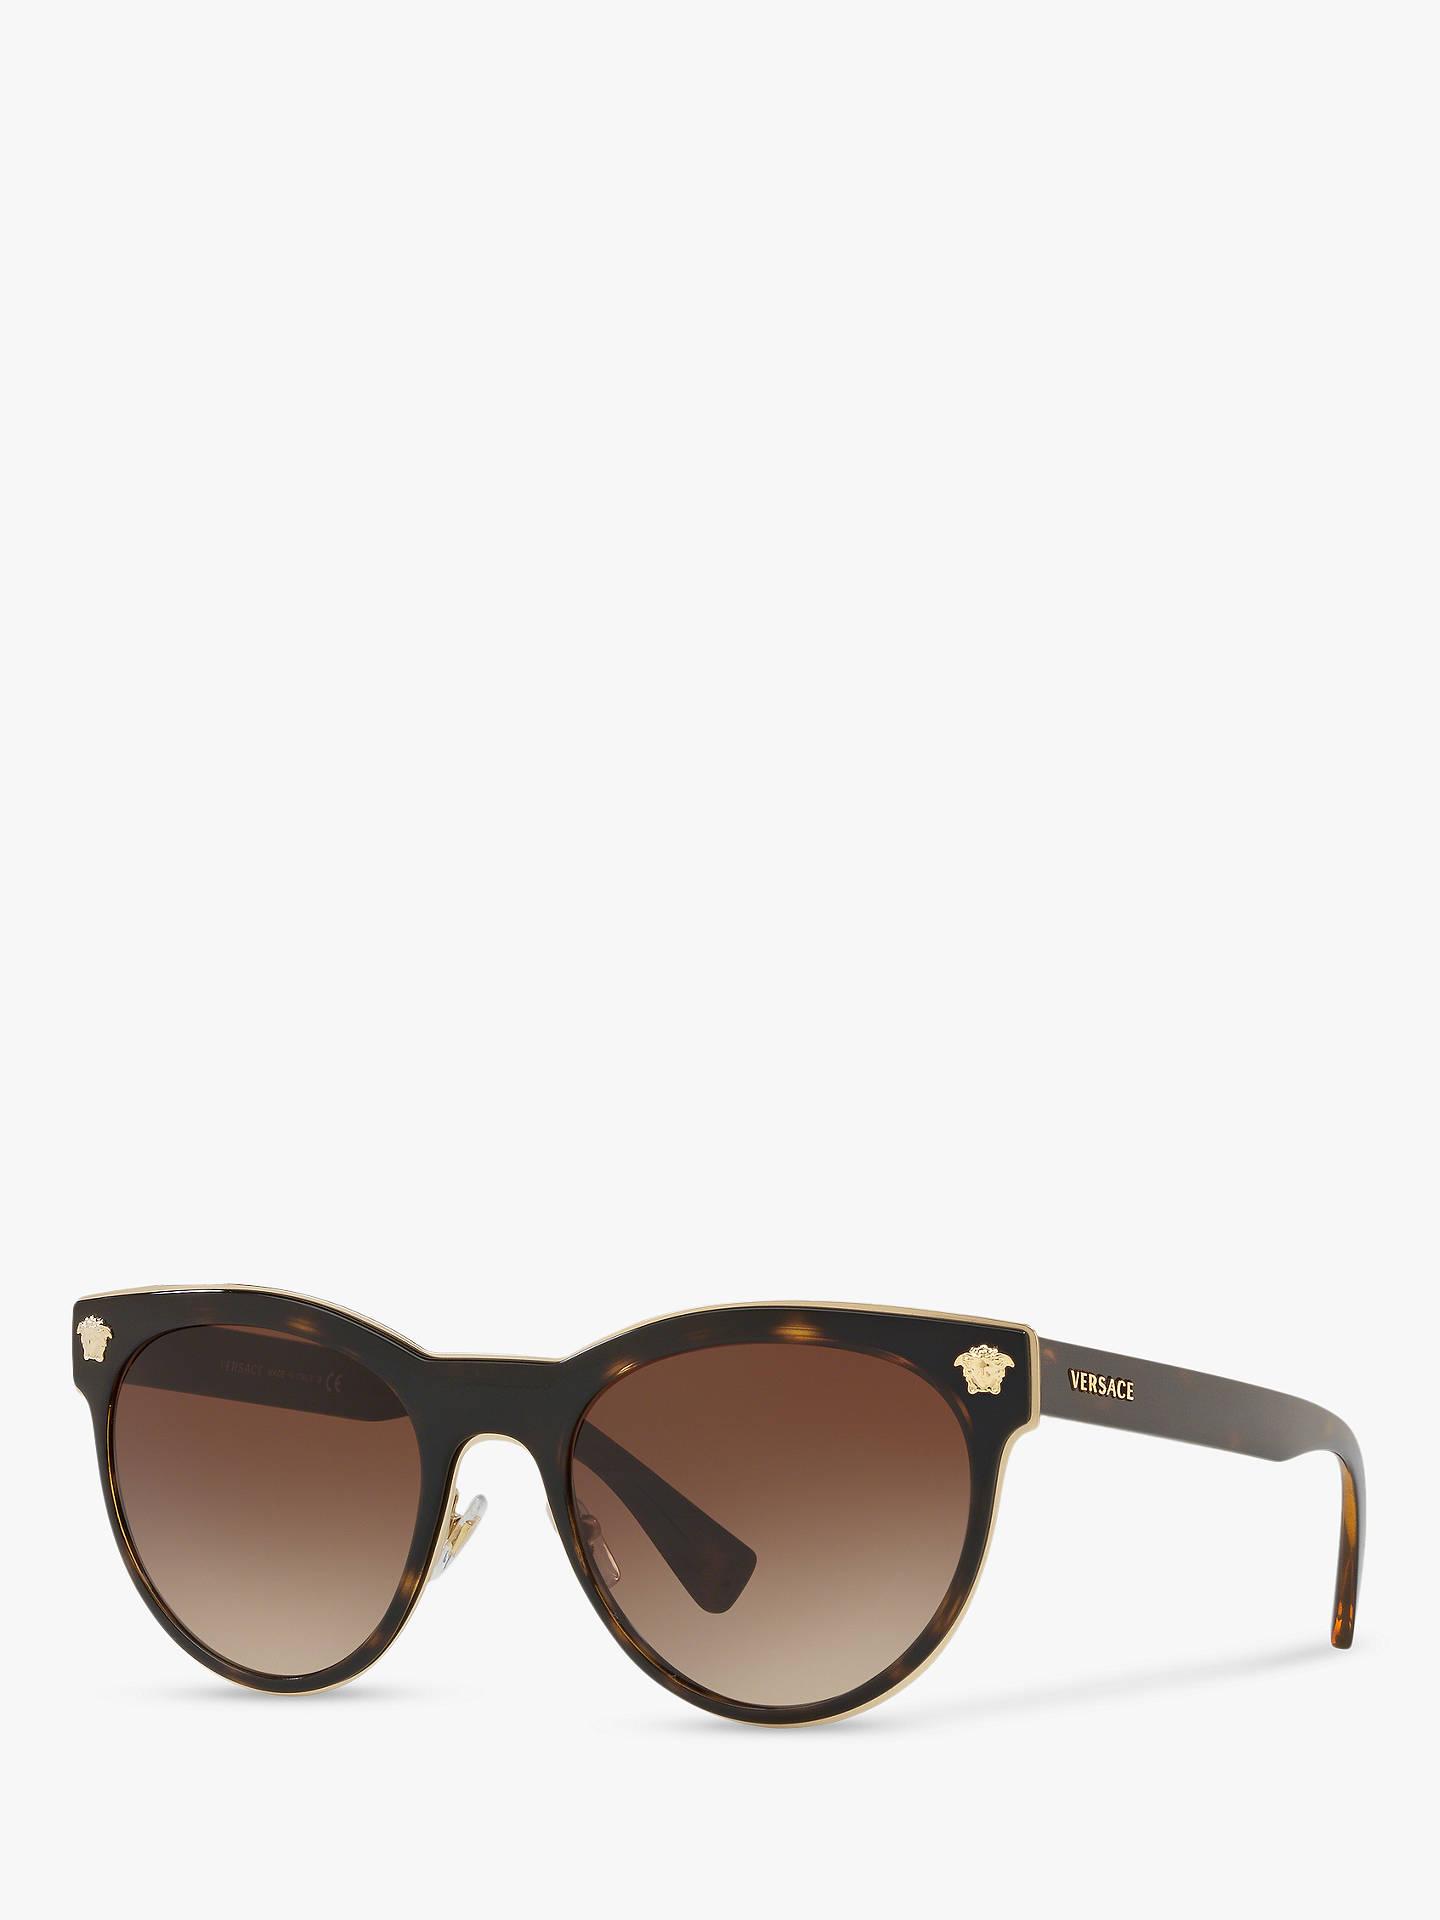 e6bc07cc27 Buy Versace VE2198 Women s Oval Sunglasses